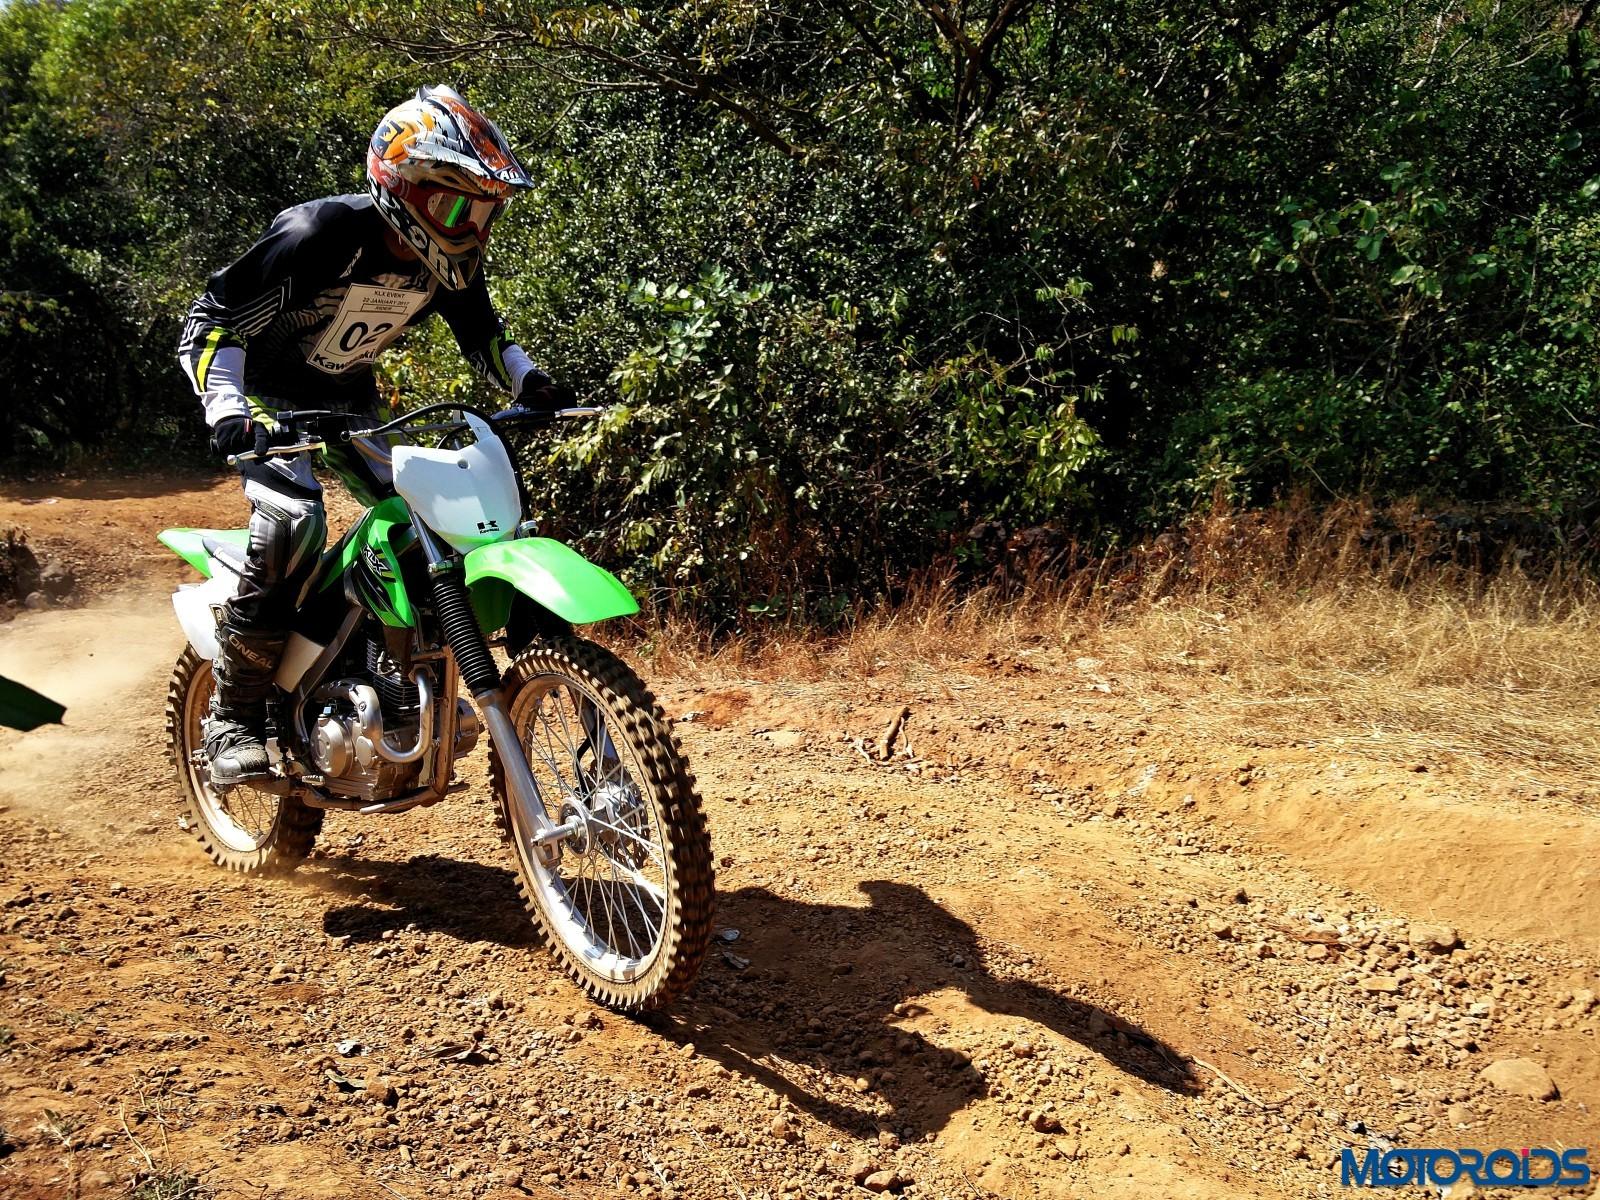 Kawasaki-KLX140G-Ride-Experience-49